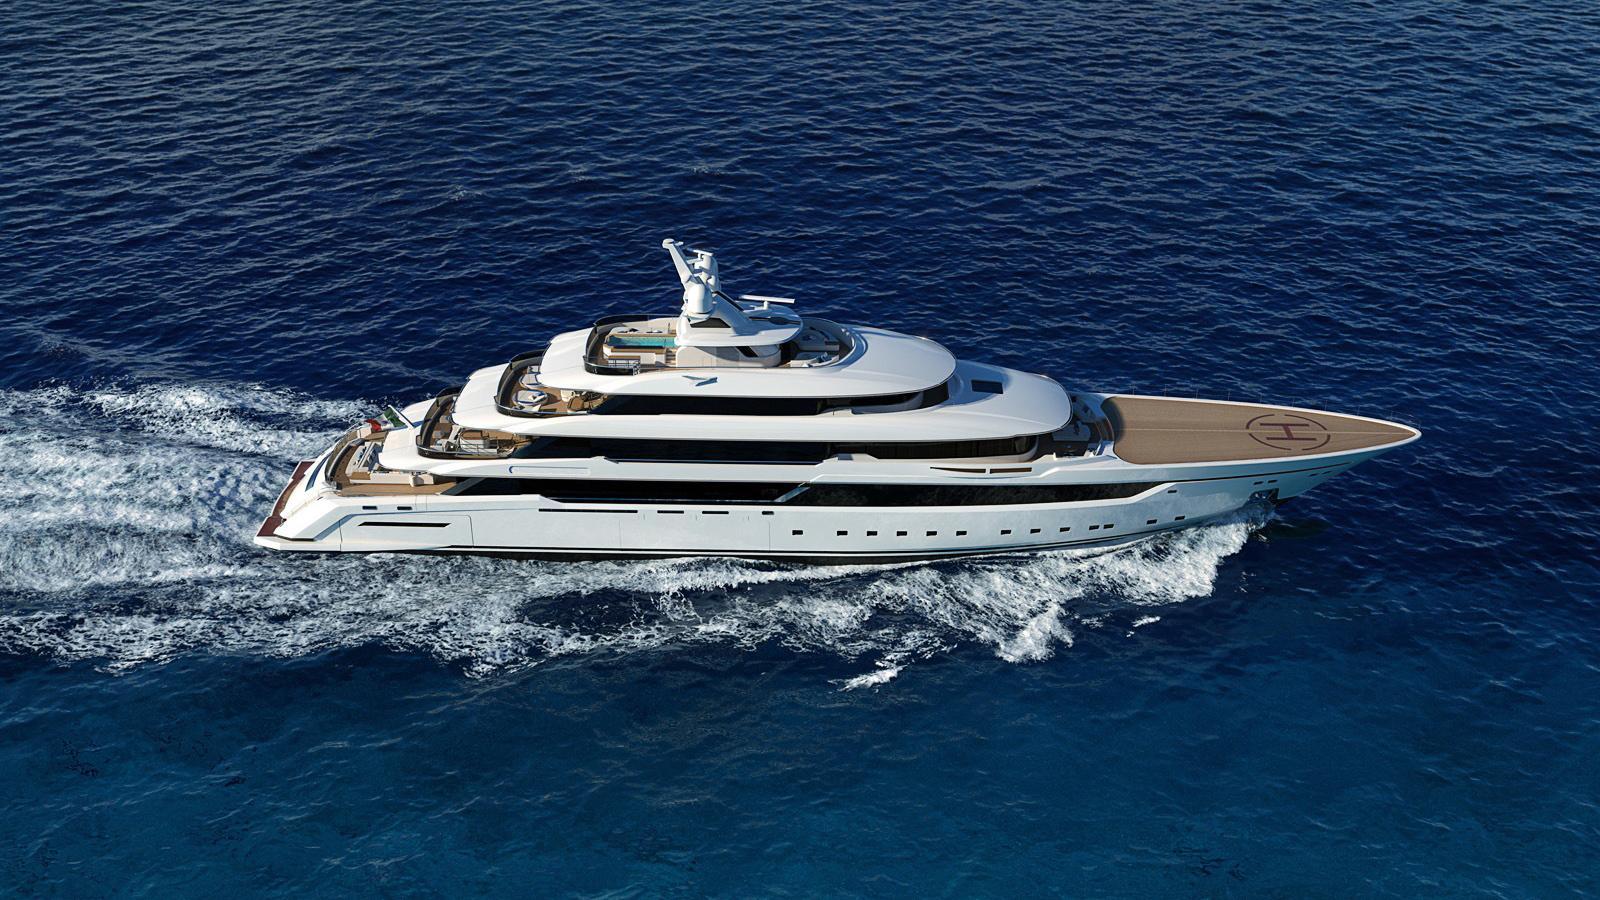 columbus classic 80m motoryacht palumbo 80m 2018 rendering profile